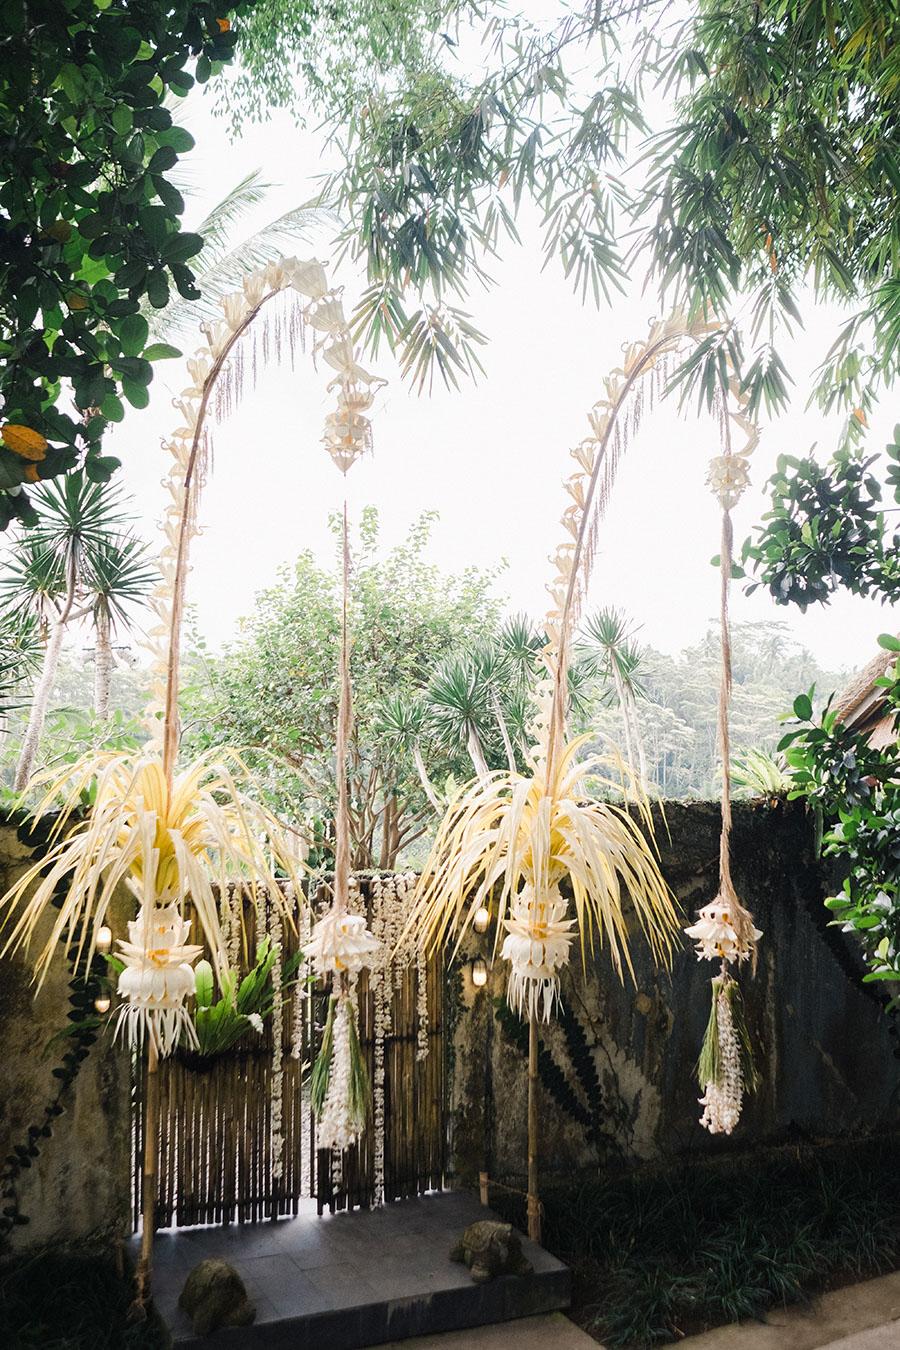 Balinese penjor